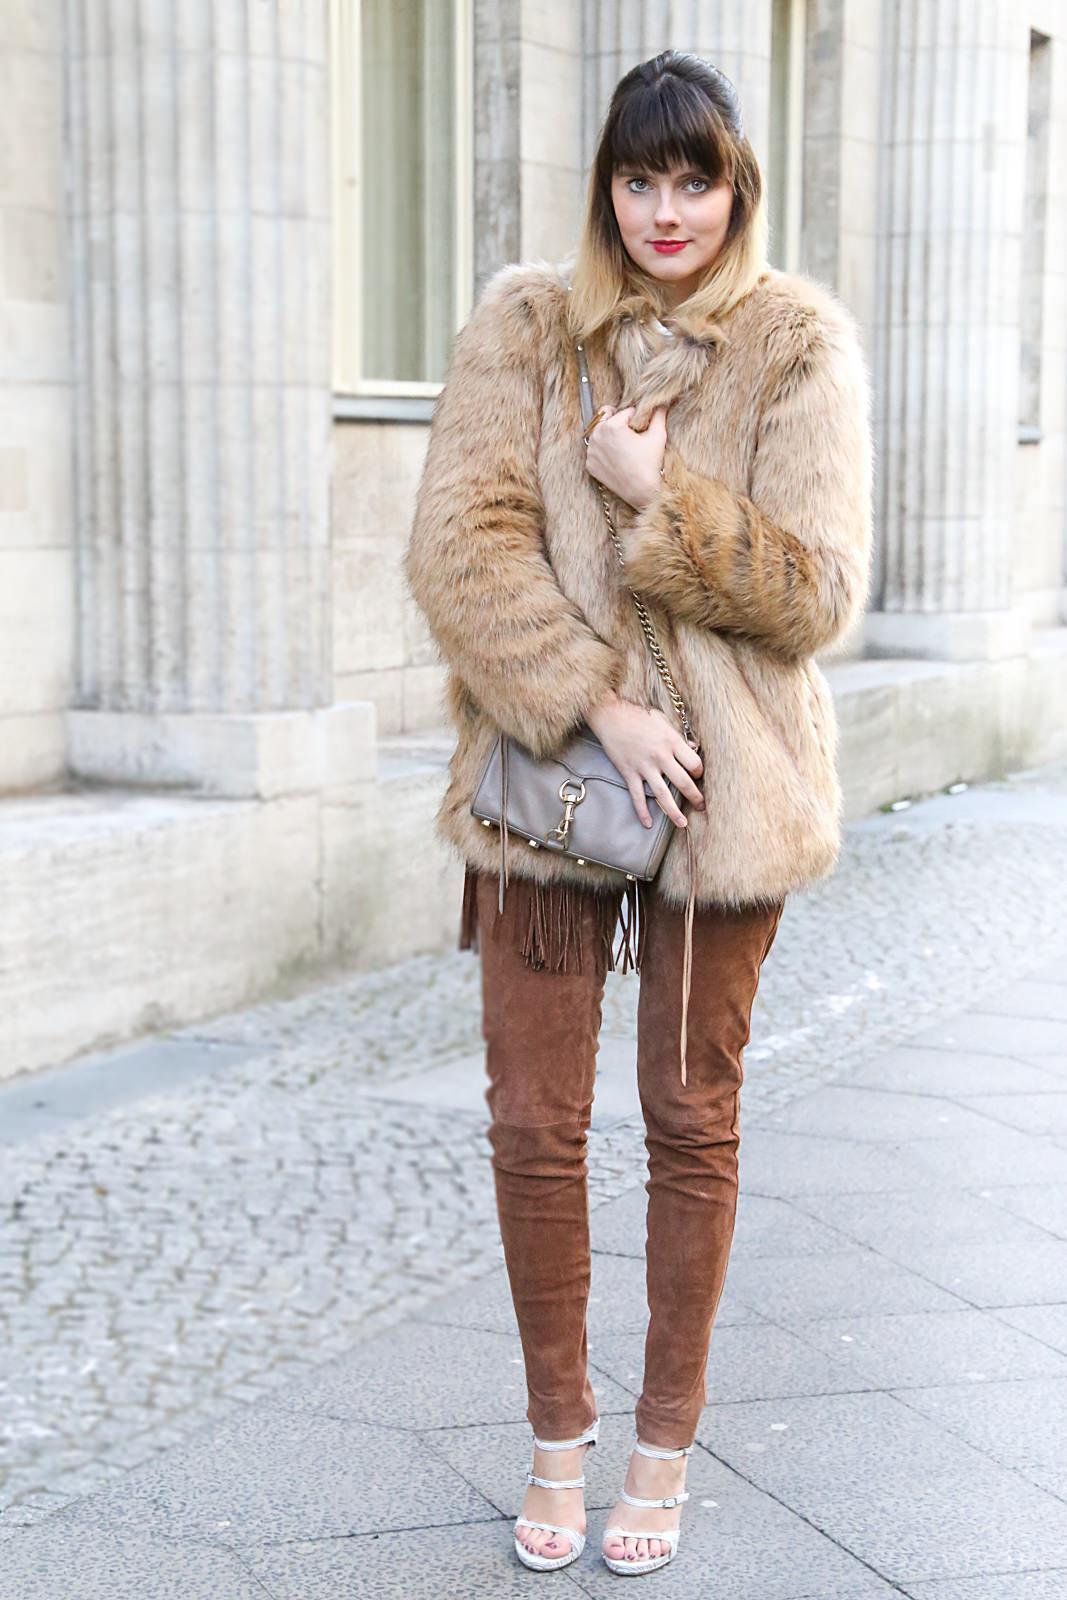 MBFW Januar 2016: Outfit mit brauner Lederhose & Fake-Fur Jacke